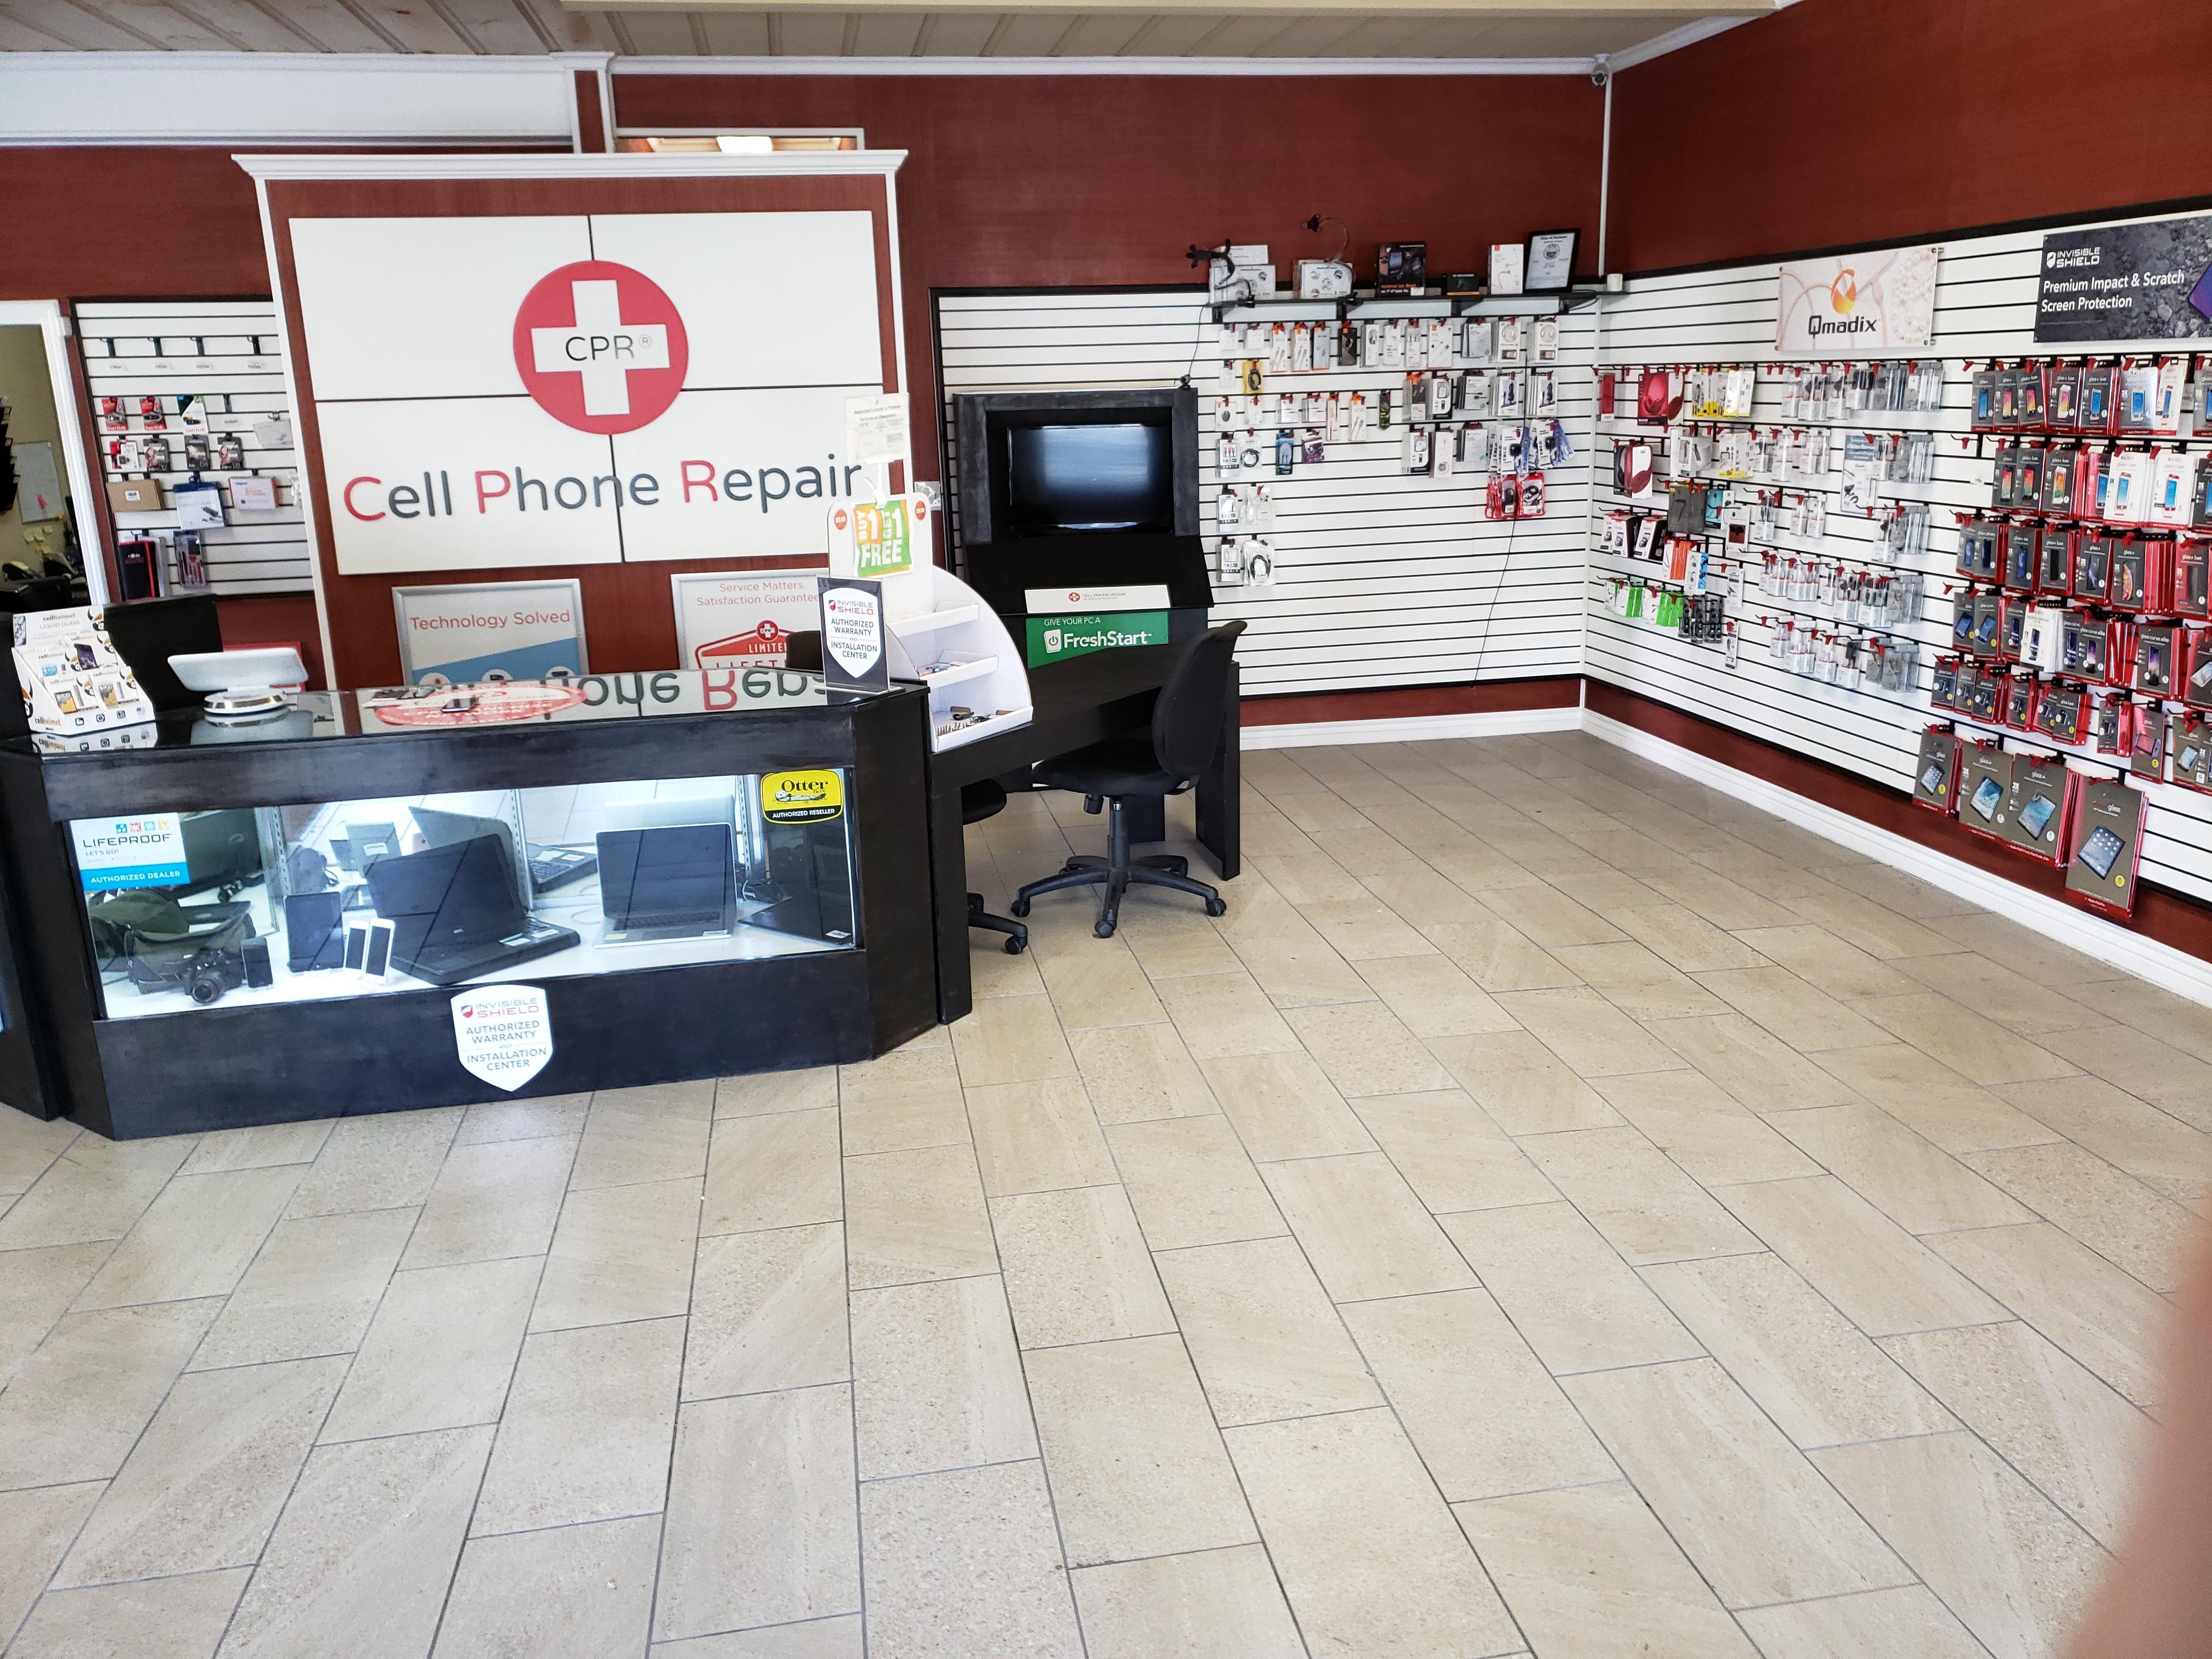 CPR Cell Phone Repair Salinas - South image 1